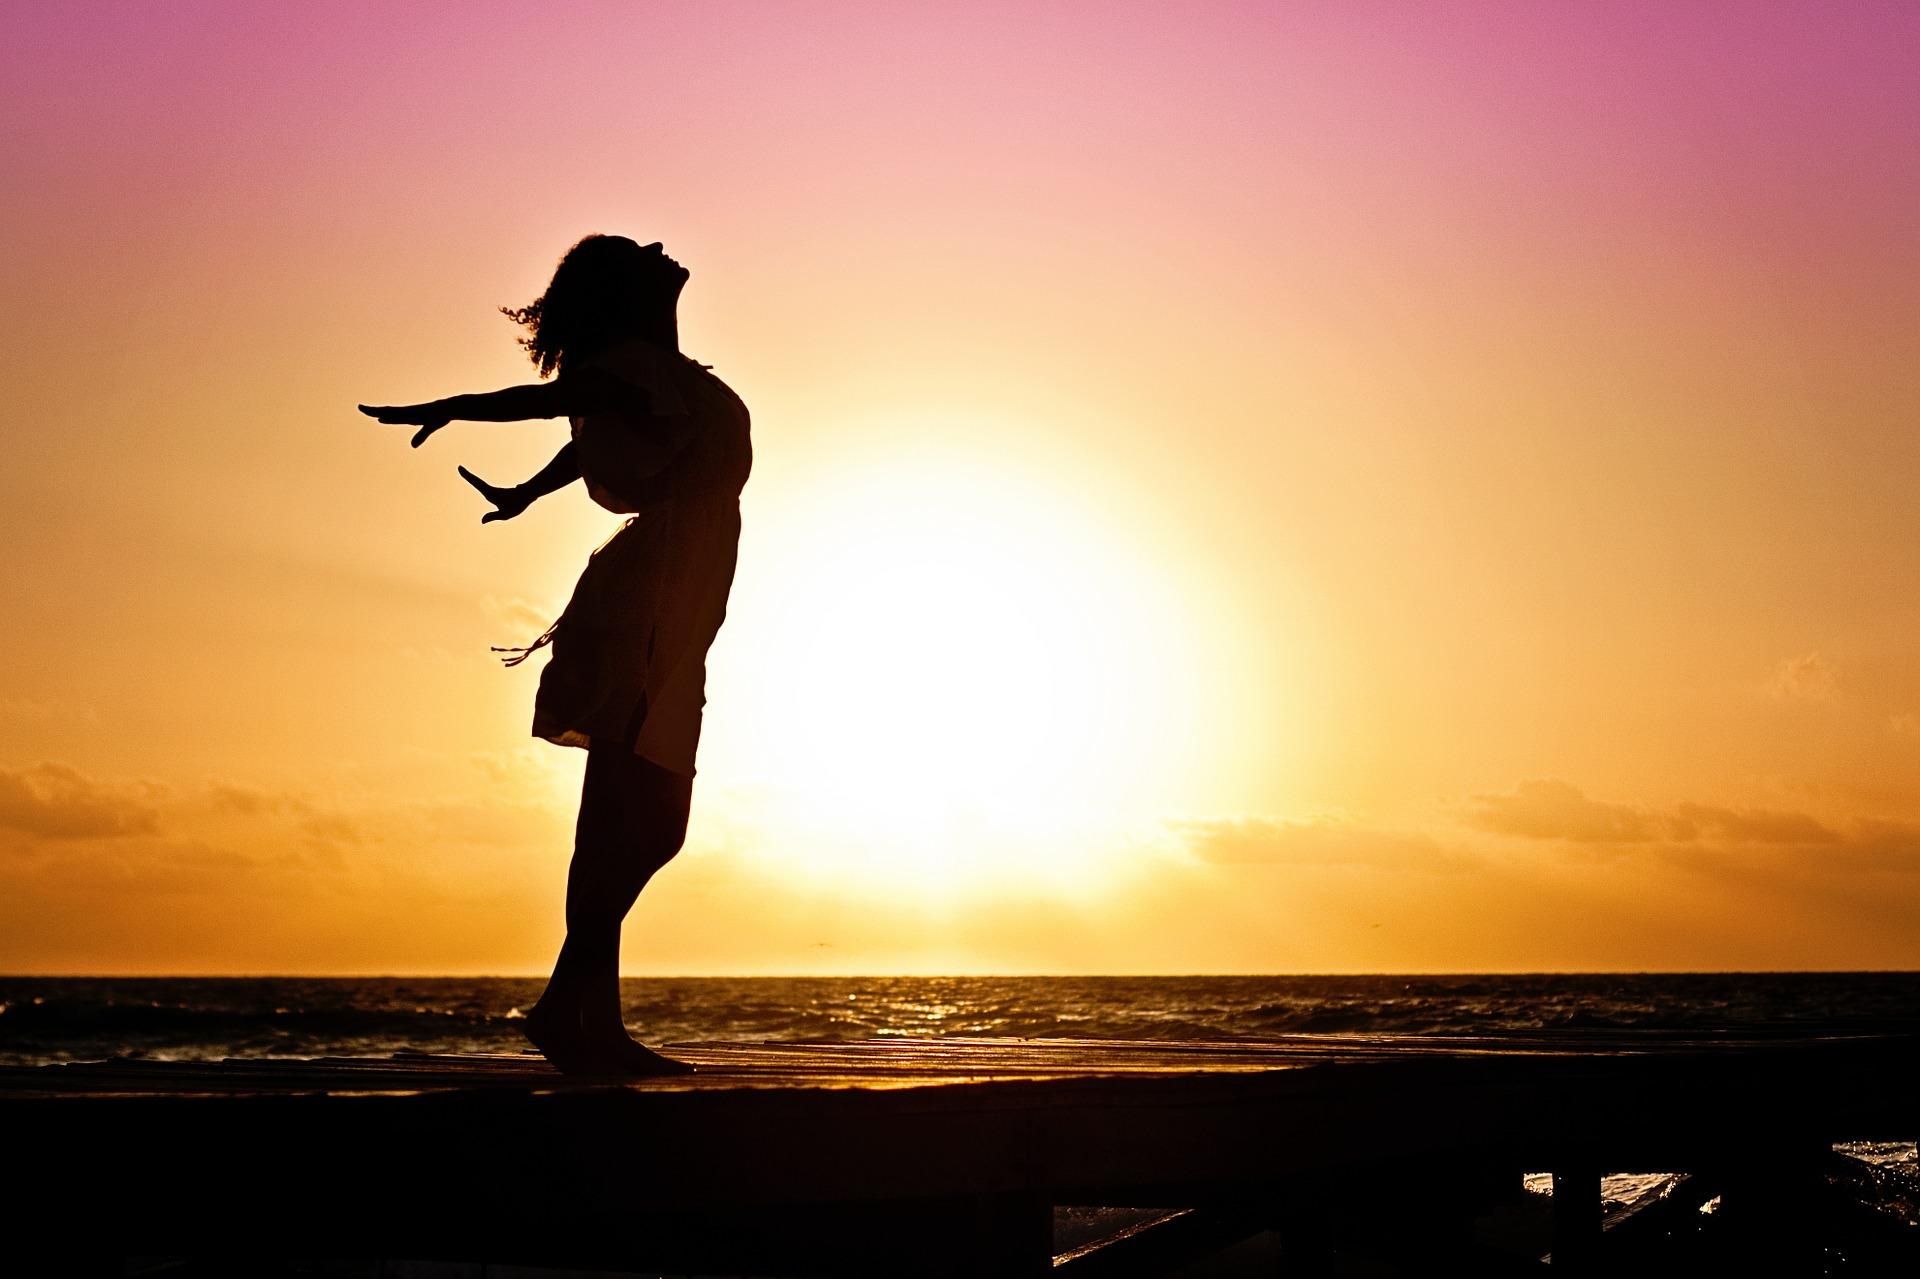 Respiratia: tehnici si metode care te vor ajuta sa respiri mai bine